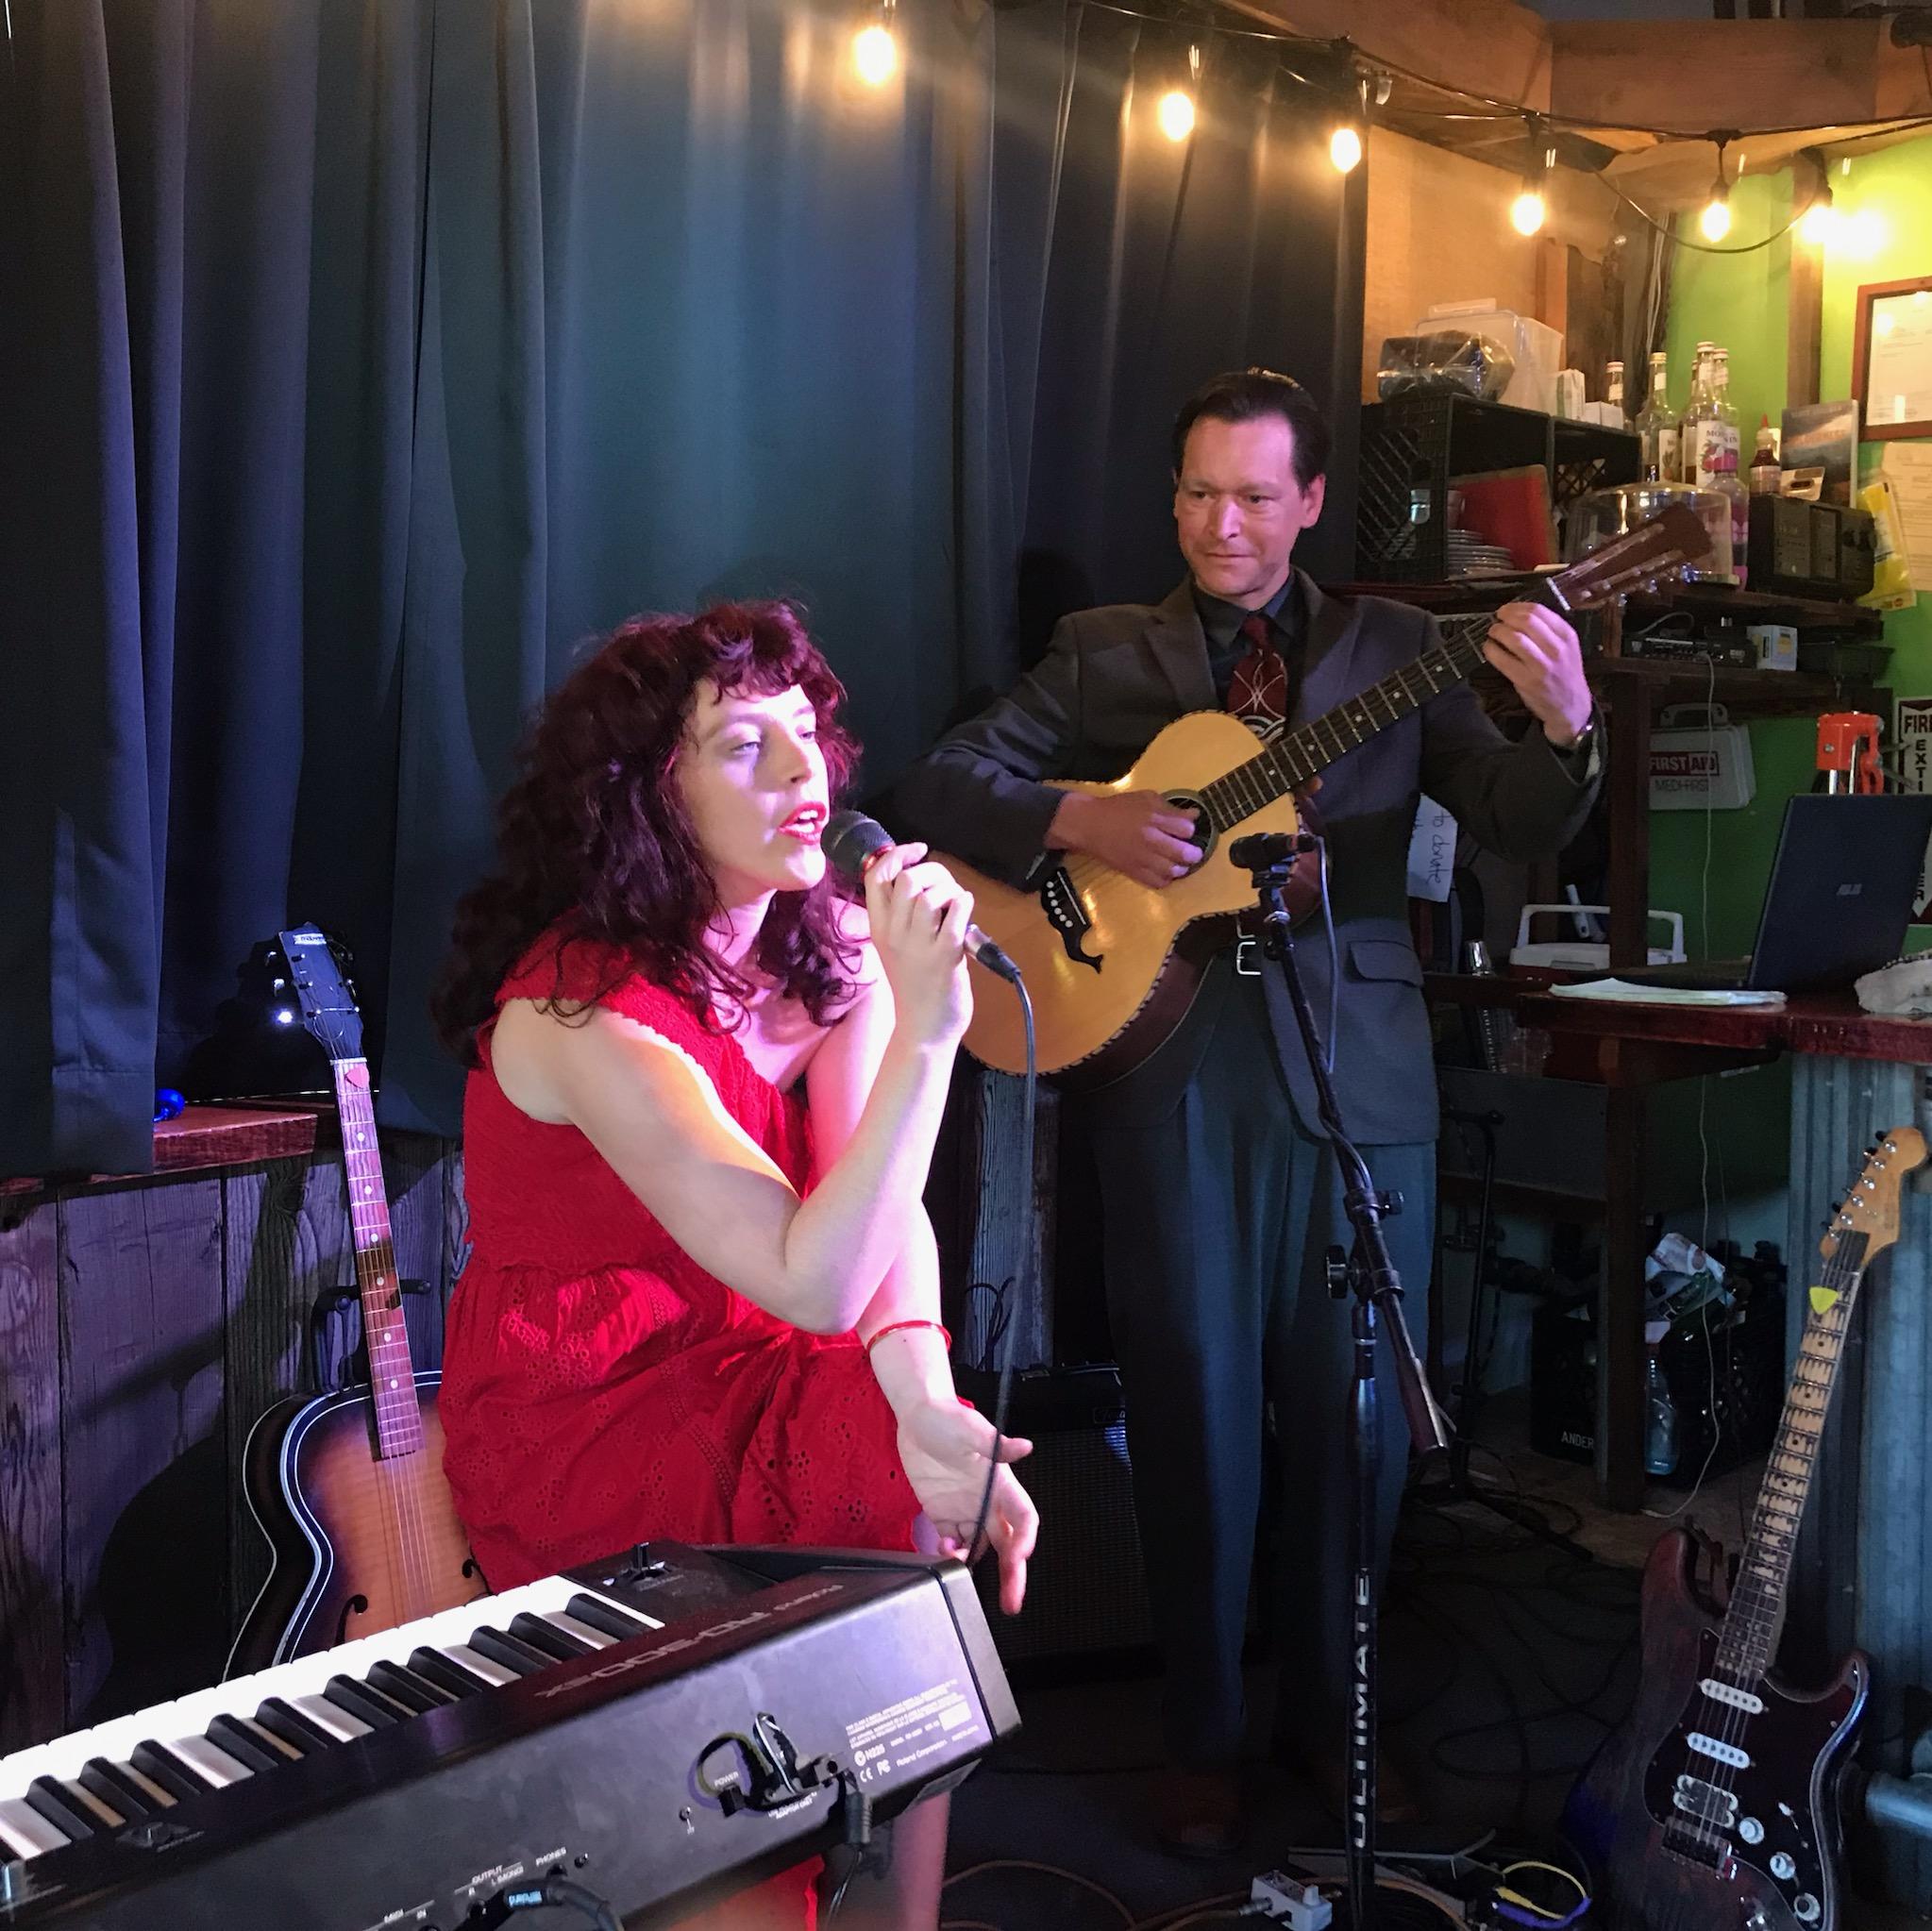 Melanie Beth Curran and Jake Sanders at The Disco Bay Detour, Washington State, May 2019